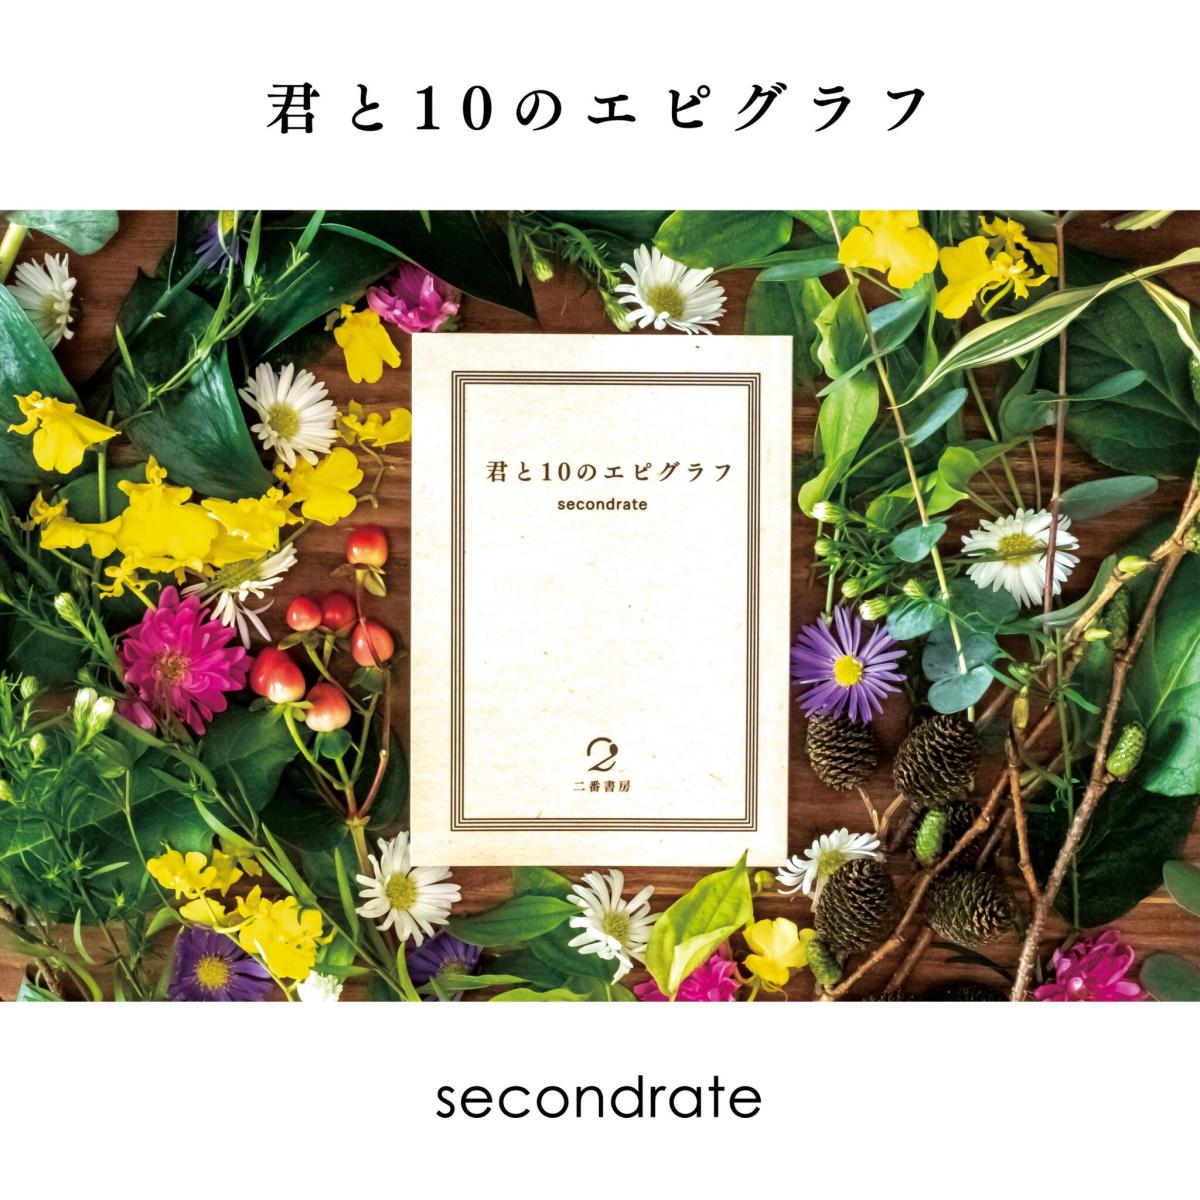 『secondrate - 冬のキセキ』収録の『君と10のエピグラフ』ジャケット